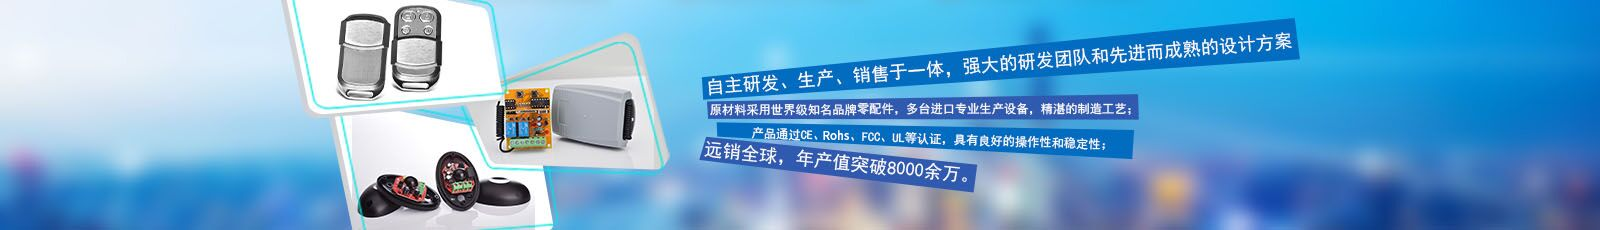 澳门电wan城网站suoyou产品均tong过CE及欧mengRoHShuan保zhi令